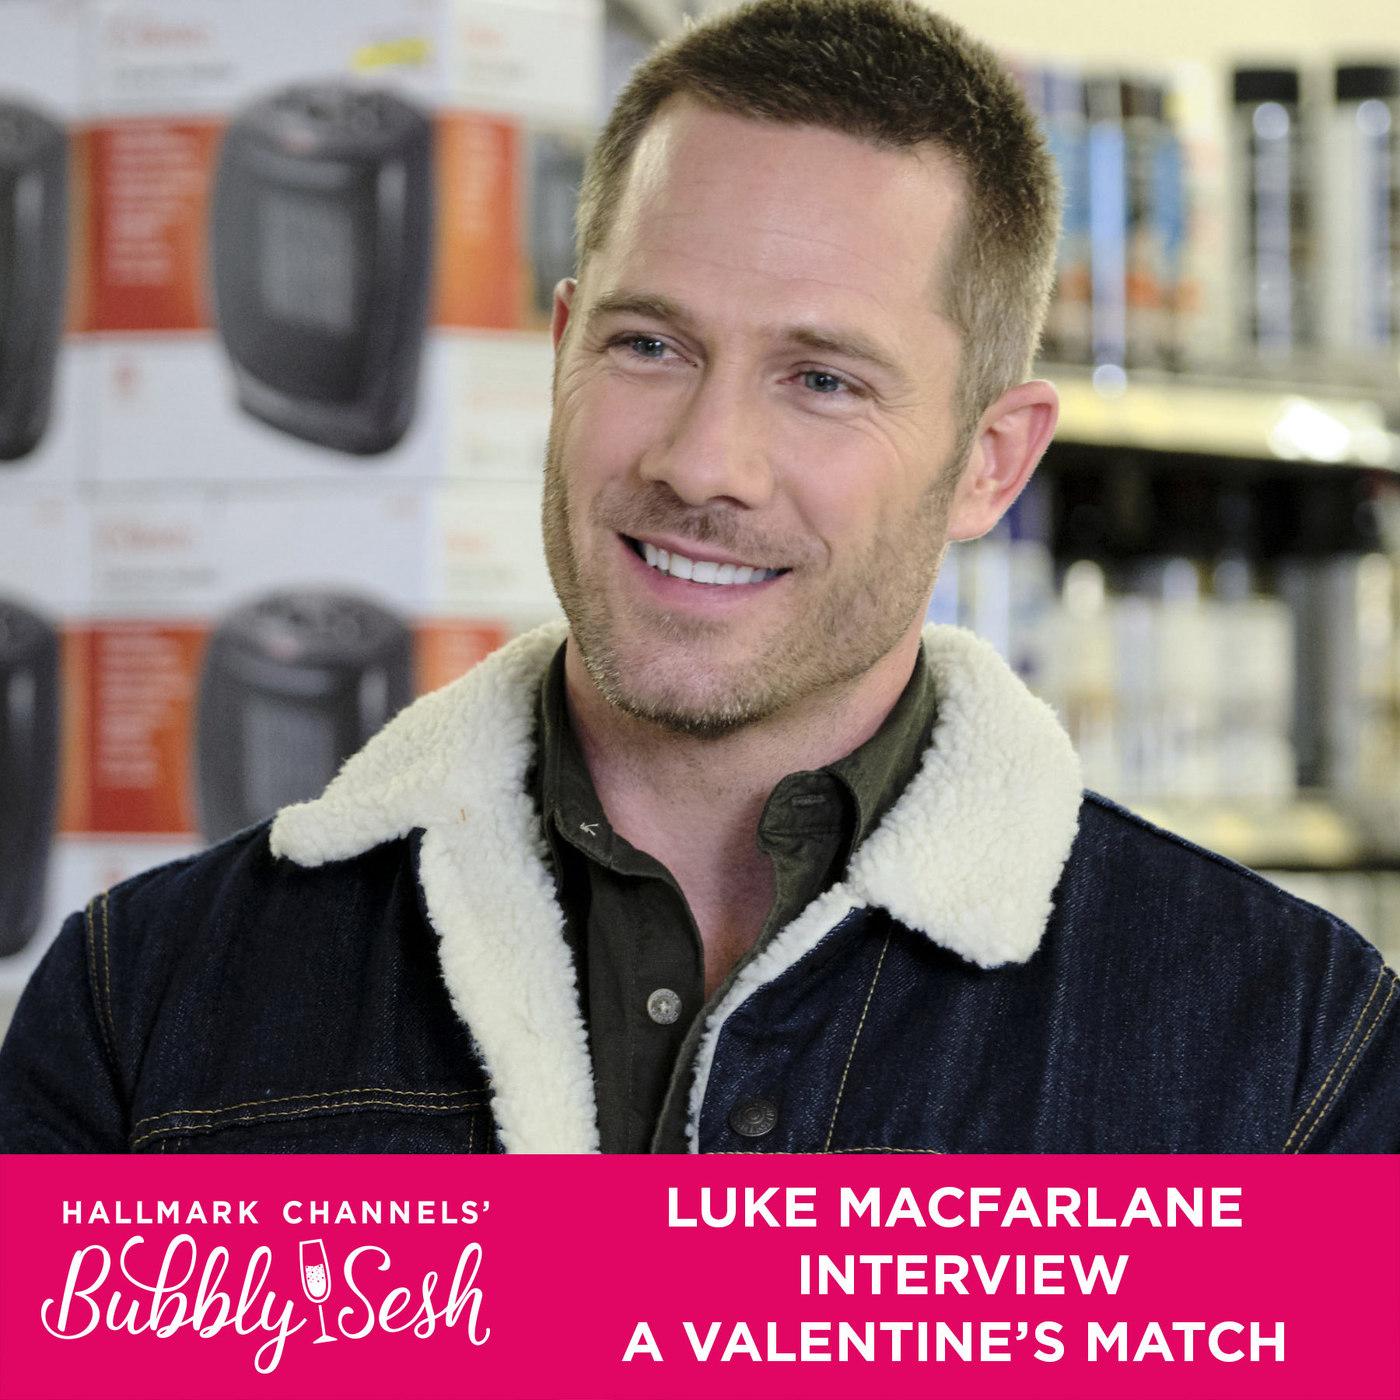 Luke Macfarlane Interview, A Valentine's Match